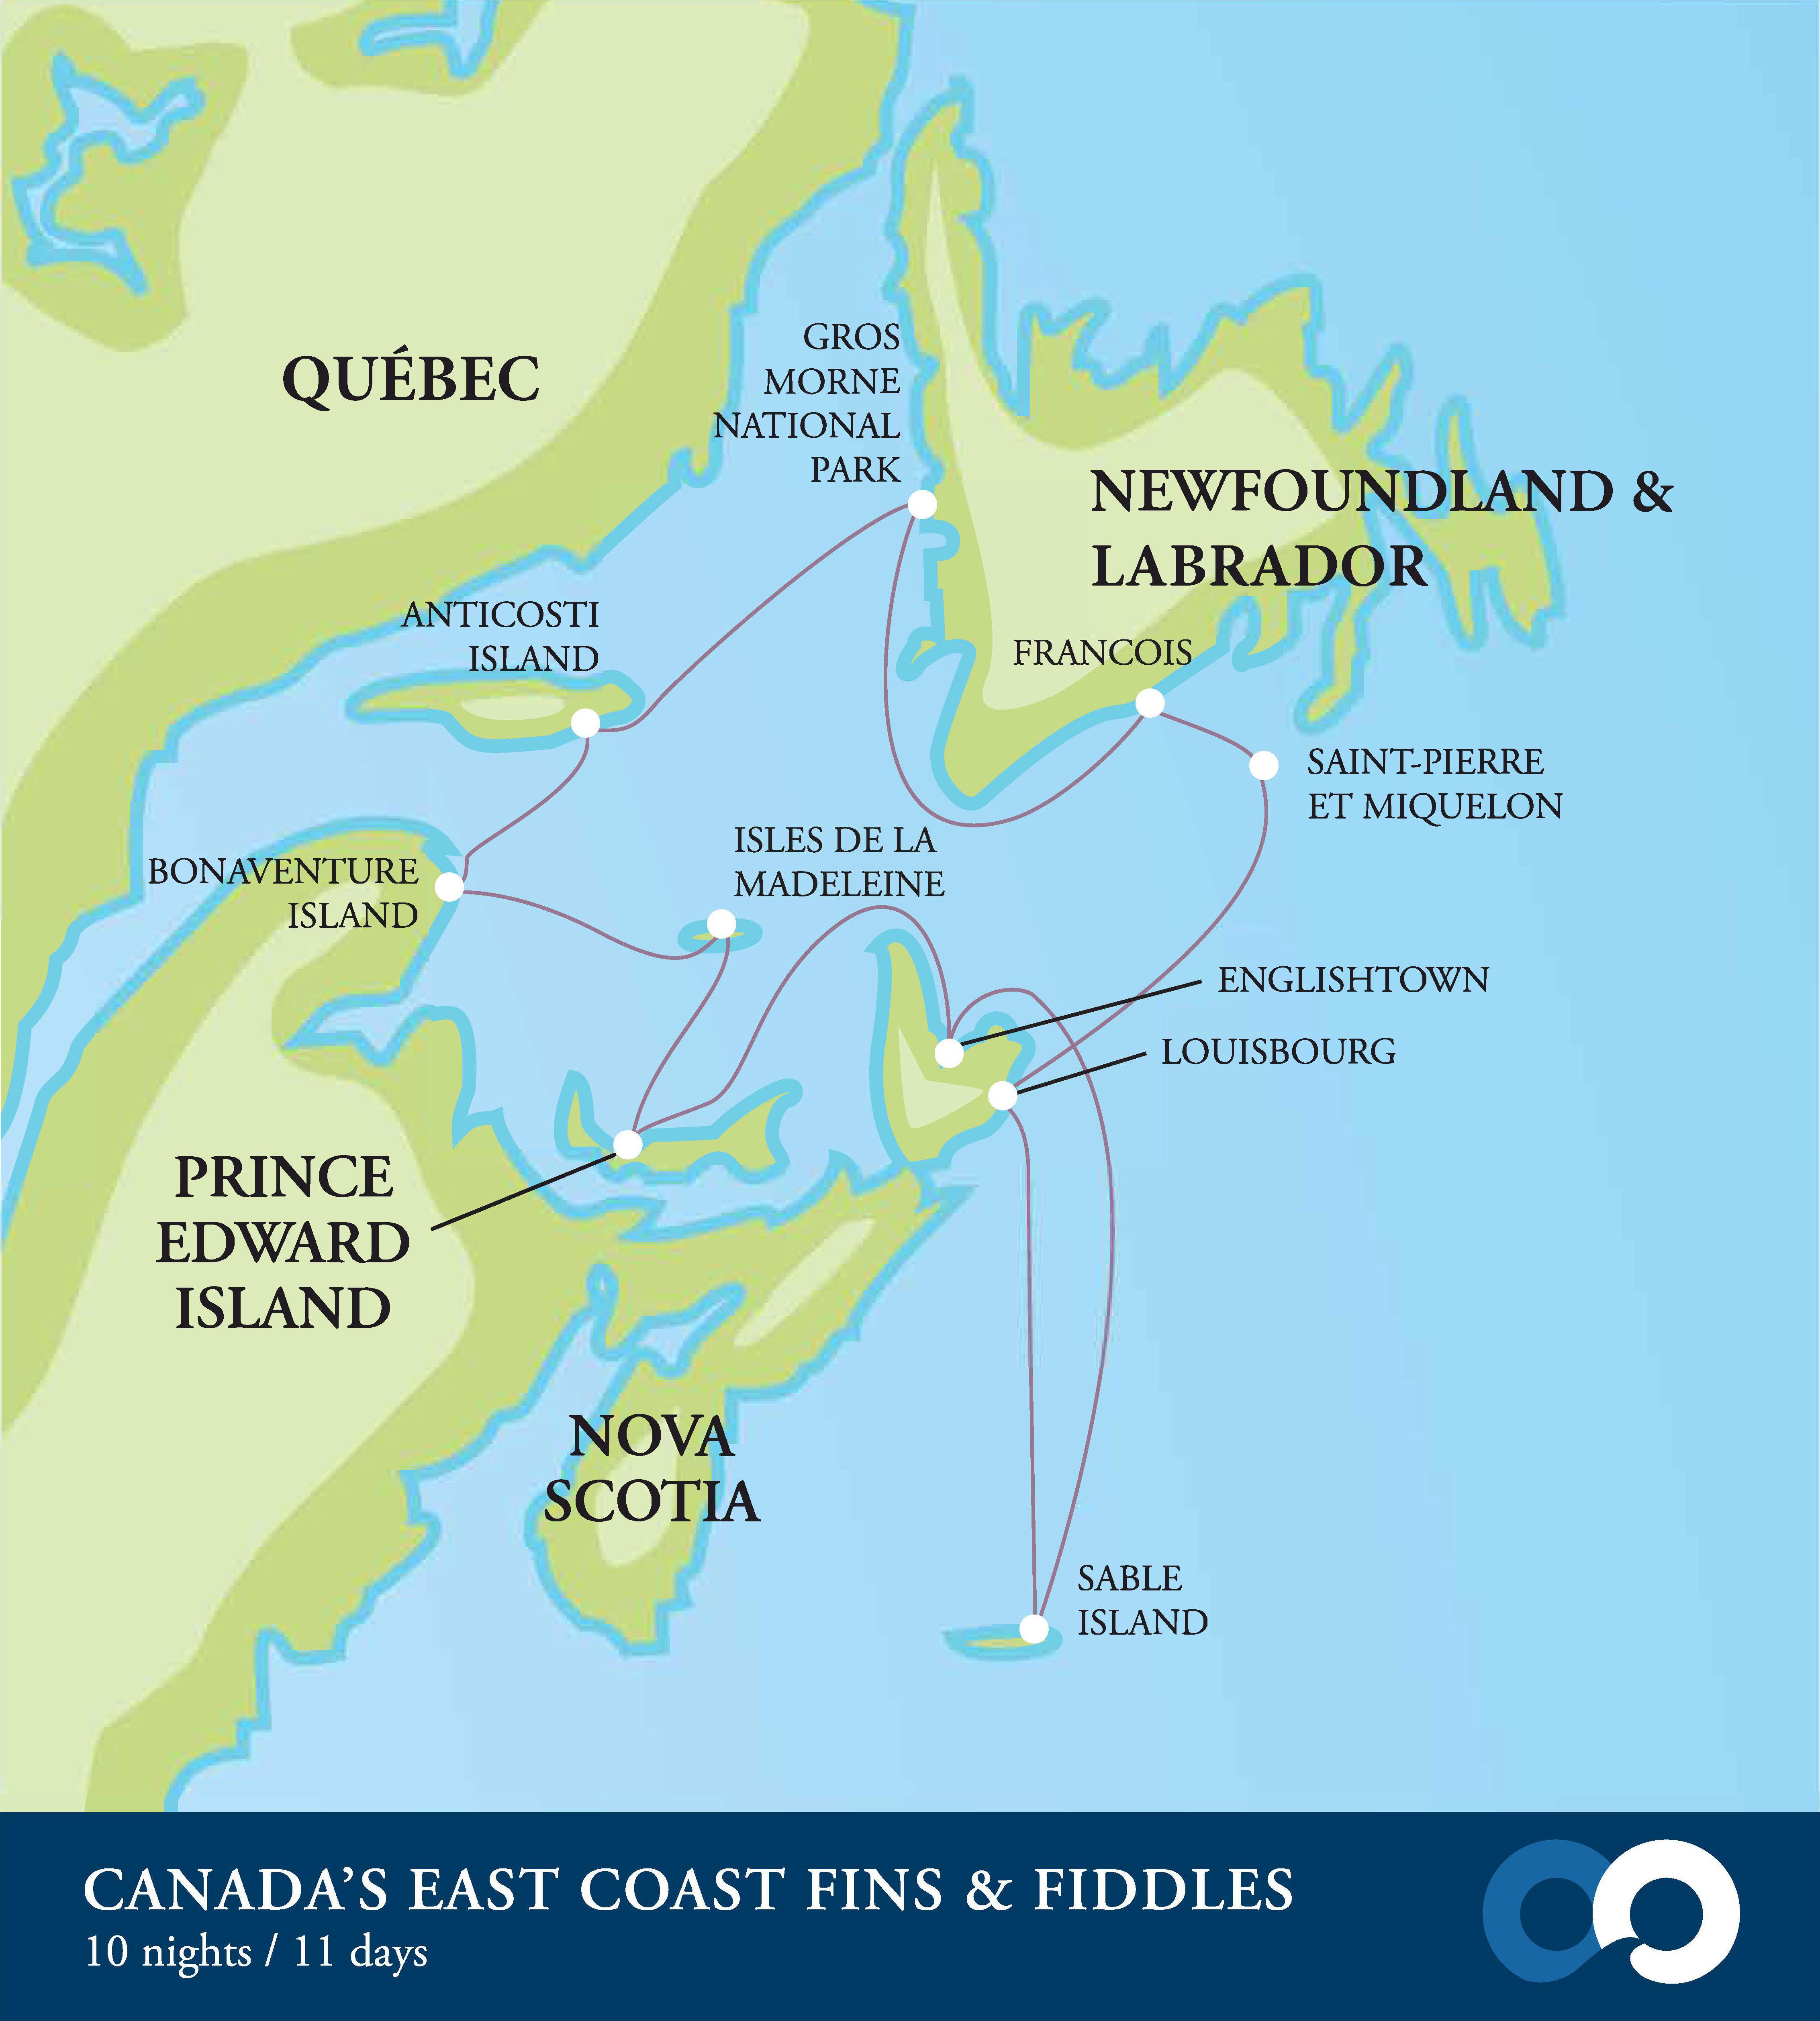 Expedition ship to Sable Island Nova Scotia